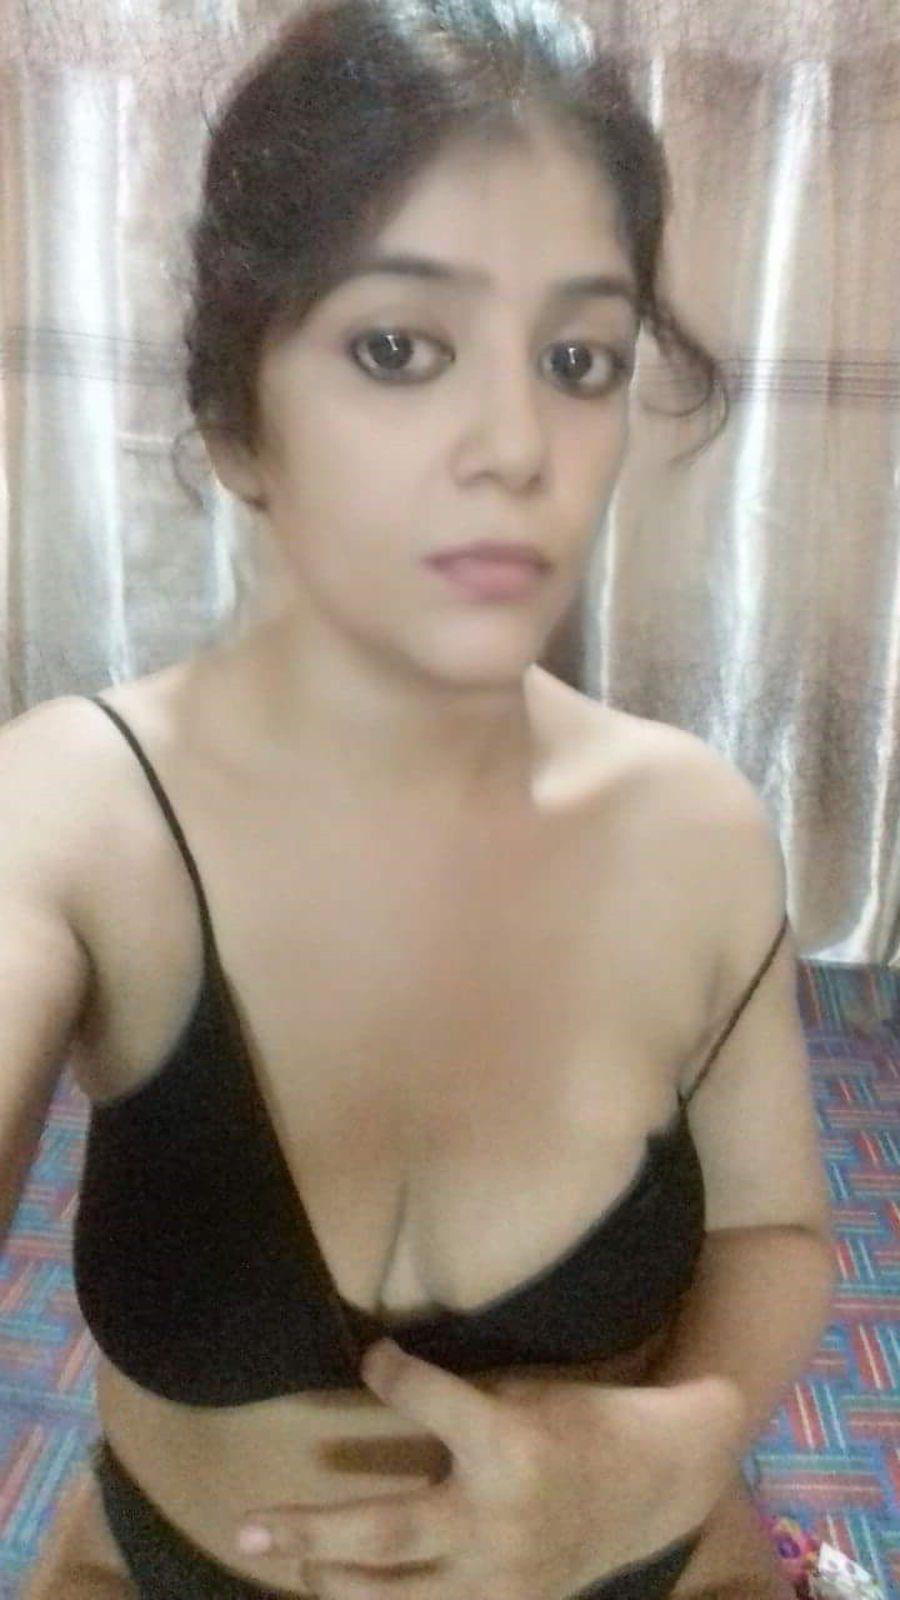 telugu young sex photos